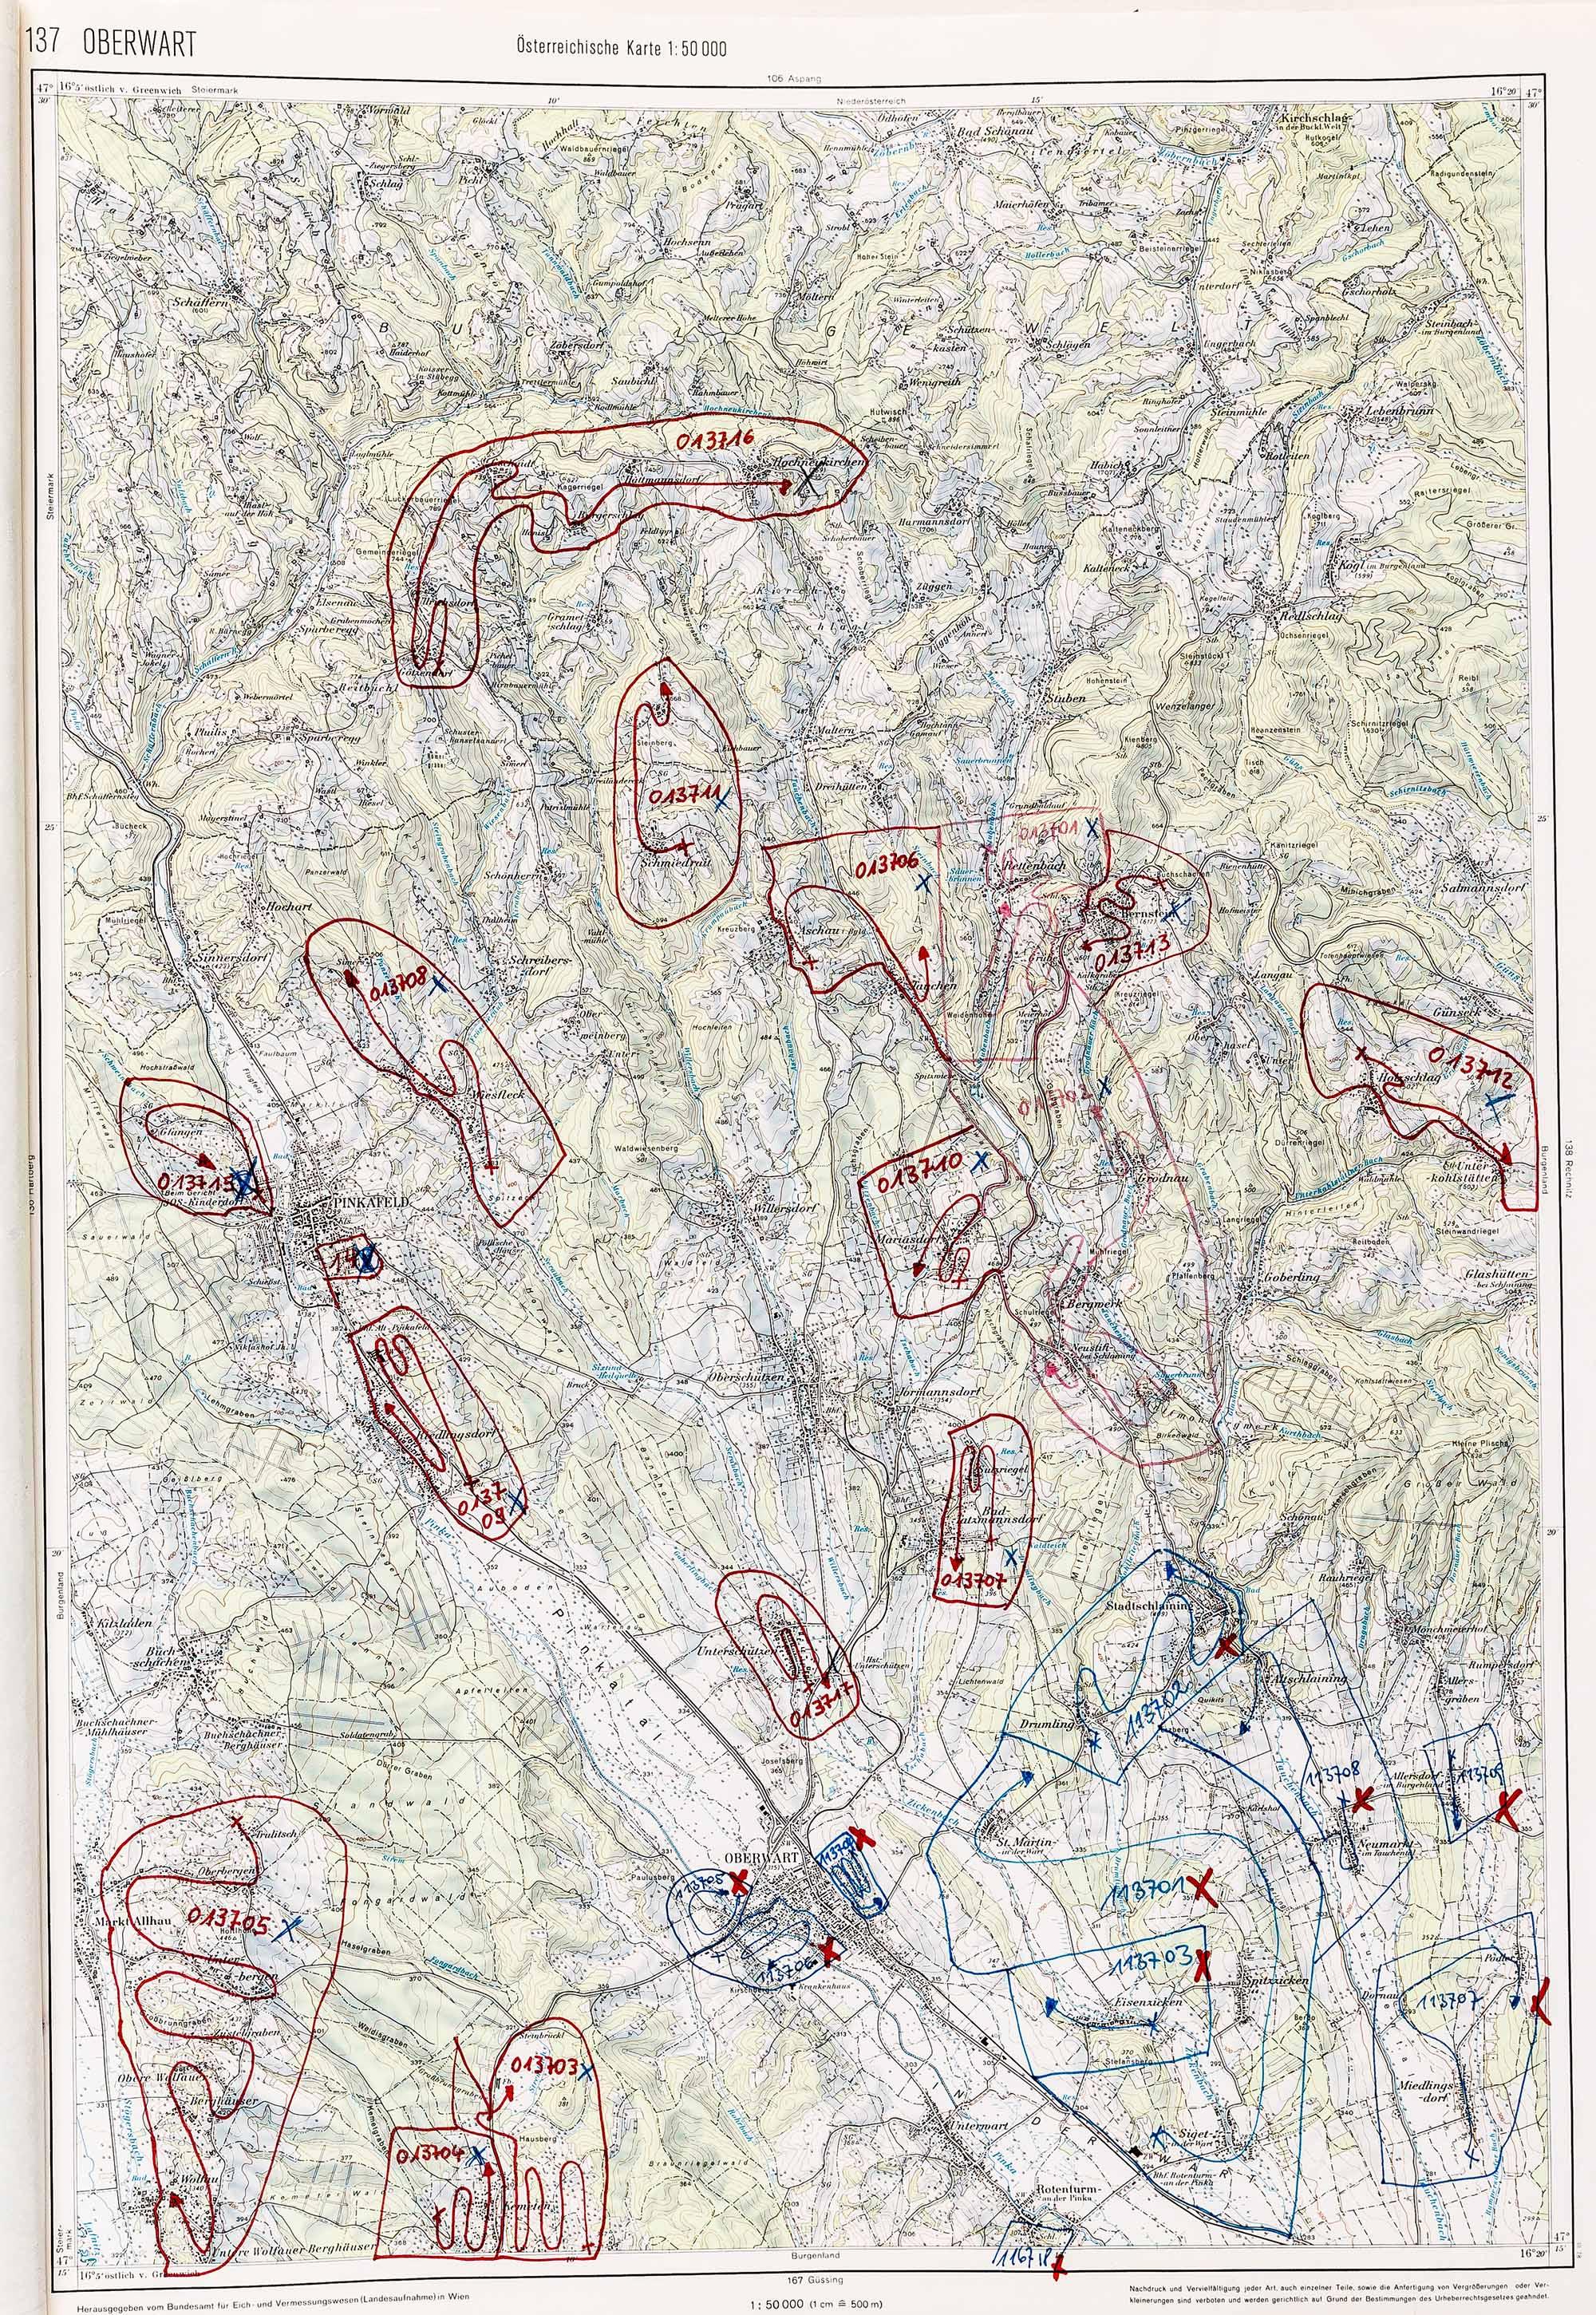 1979-1982 Karte 137